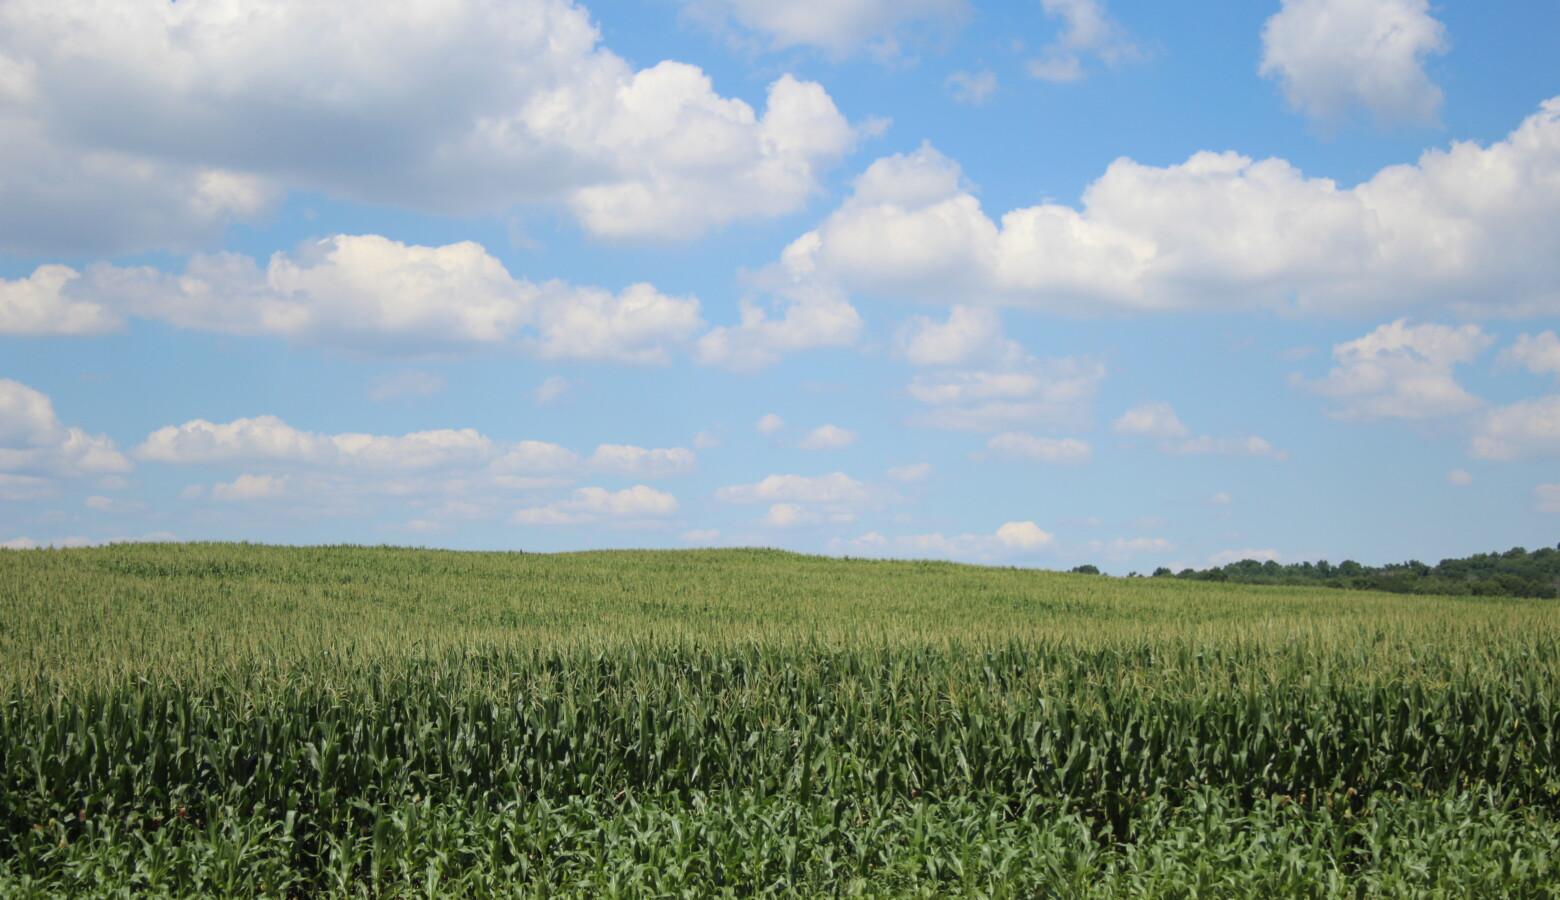 Corn field In Elkhart County, Indiana. (Samantha Horton/IPB News)